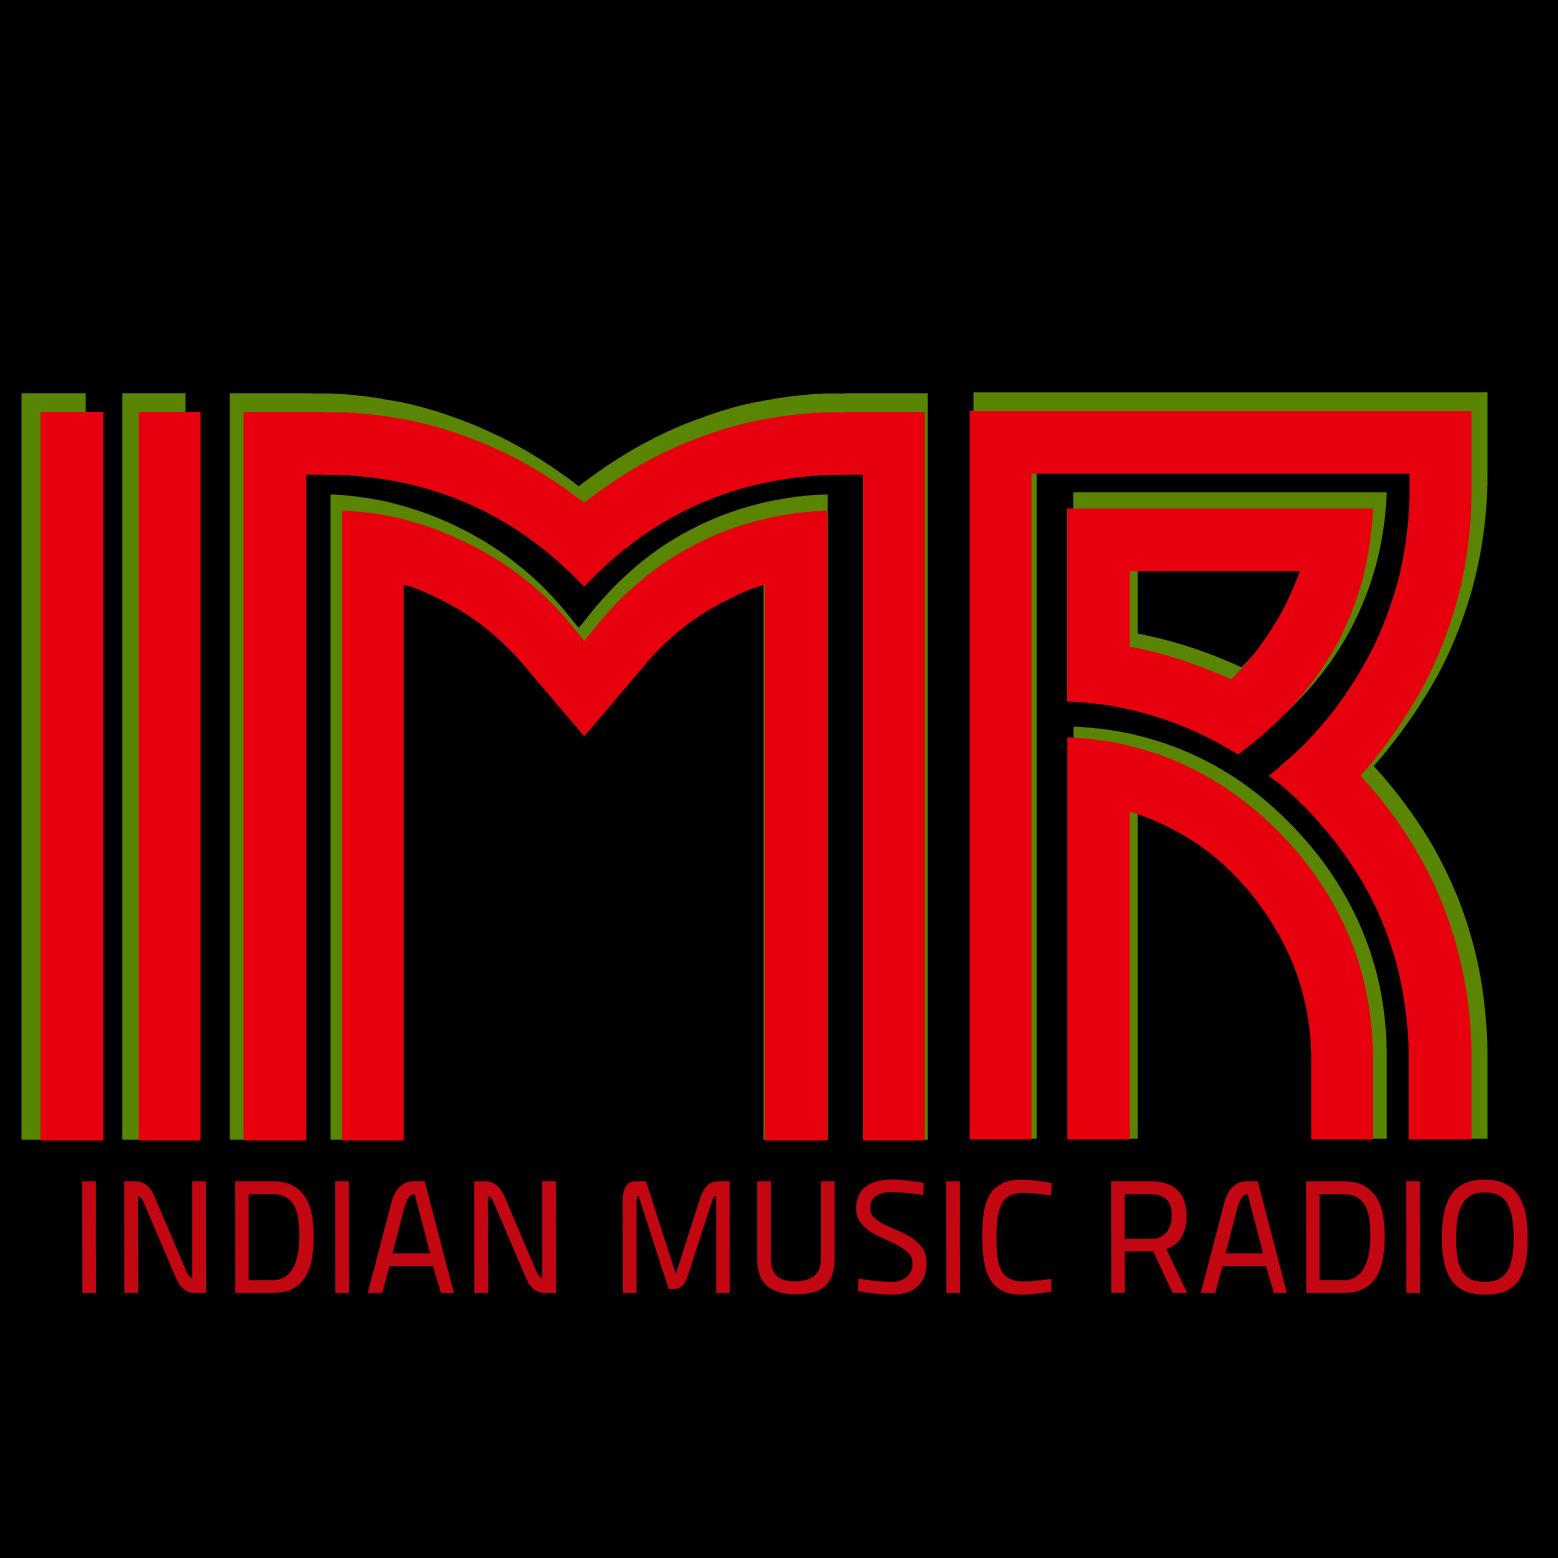 Indian Music Radio